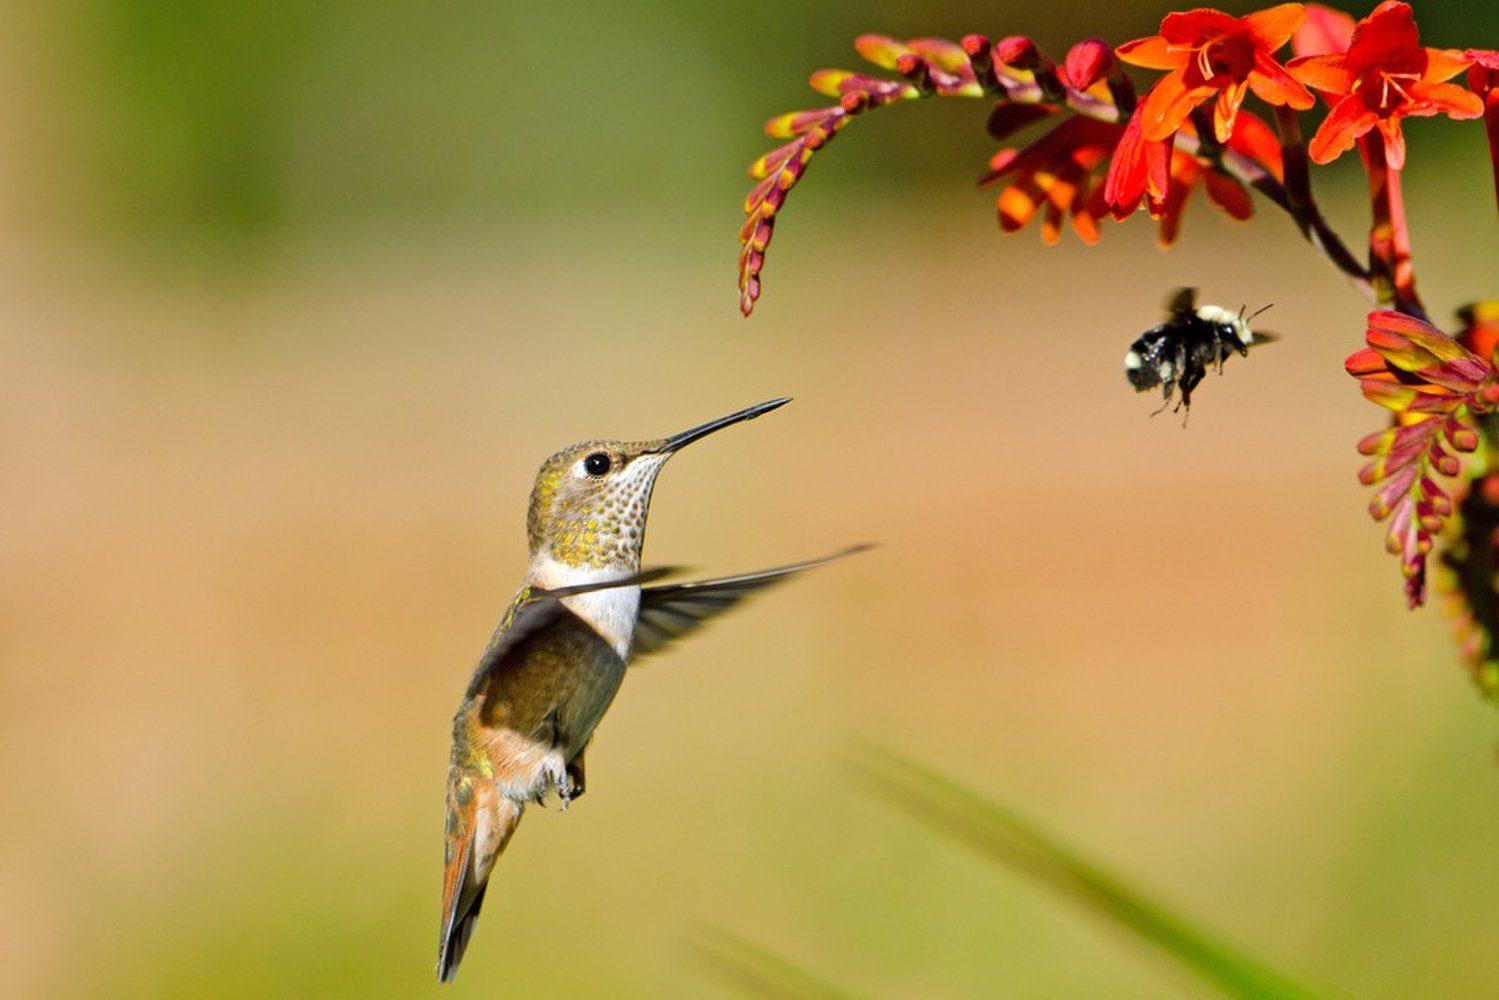 Costa Rica A Paradise For Hummingbirds The Costa Rica News